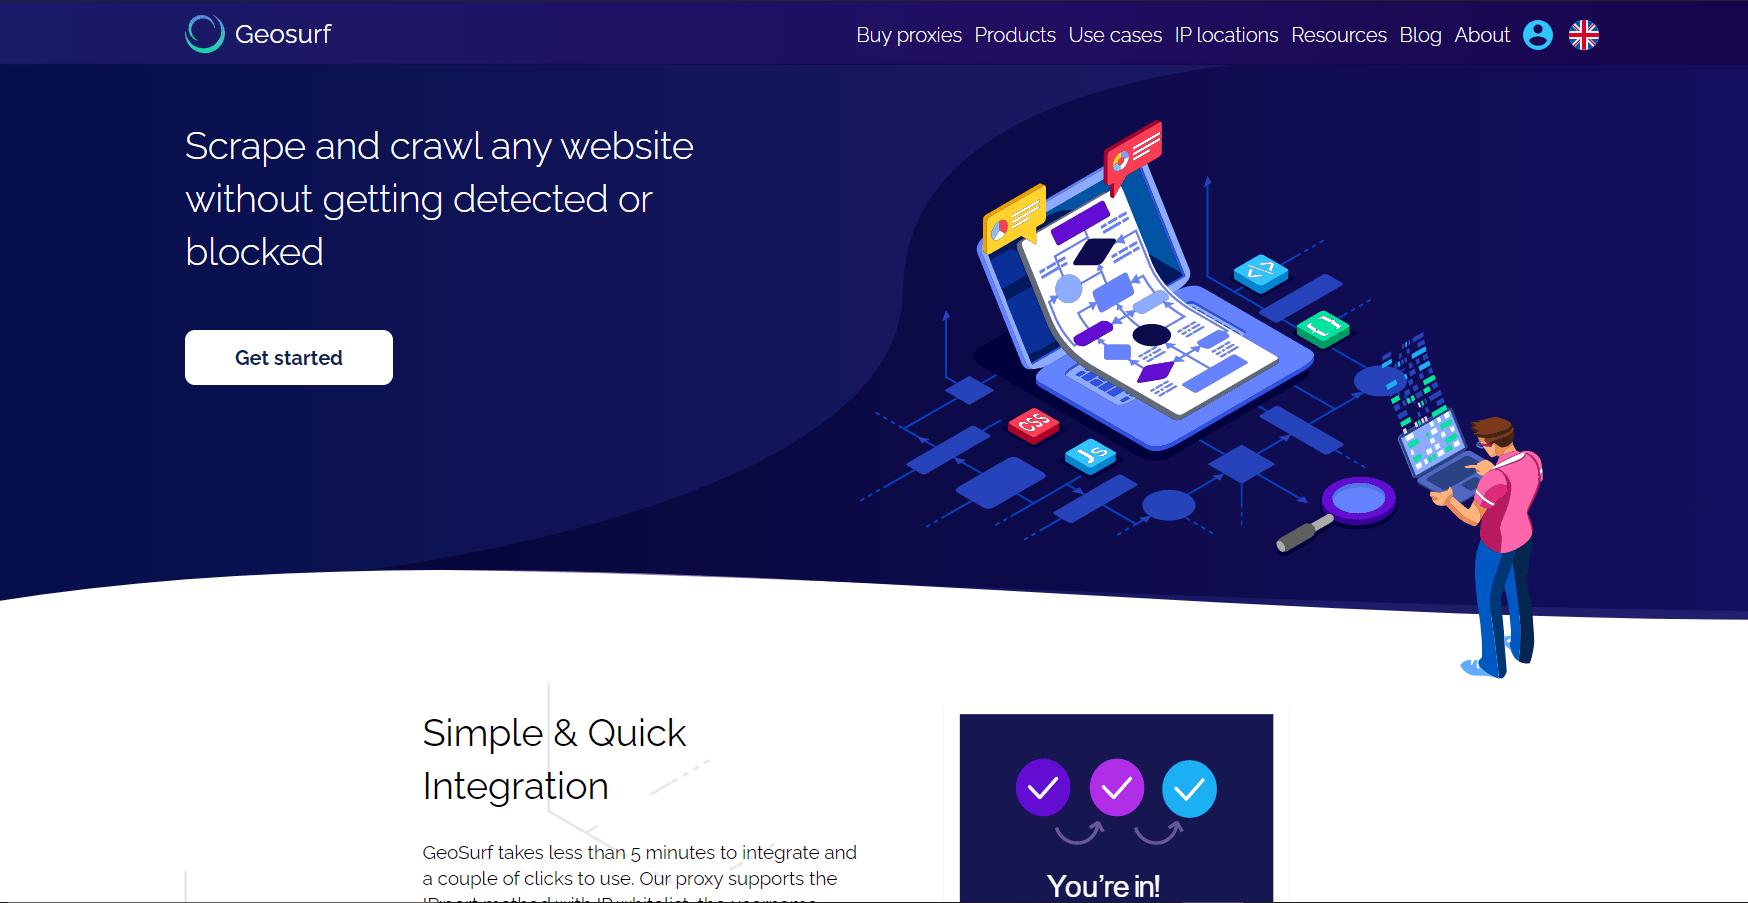 GeoSurf - Best US Proxy Provider